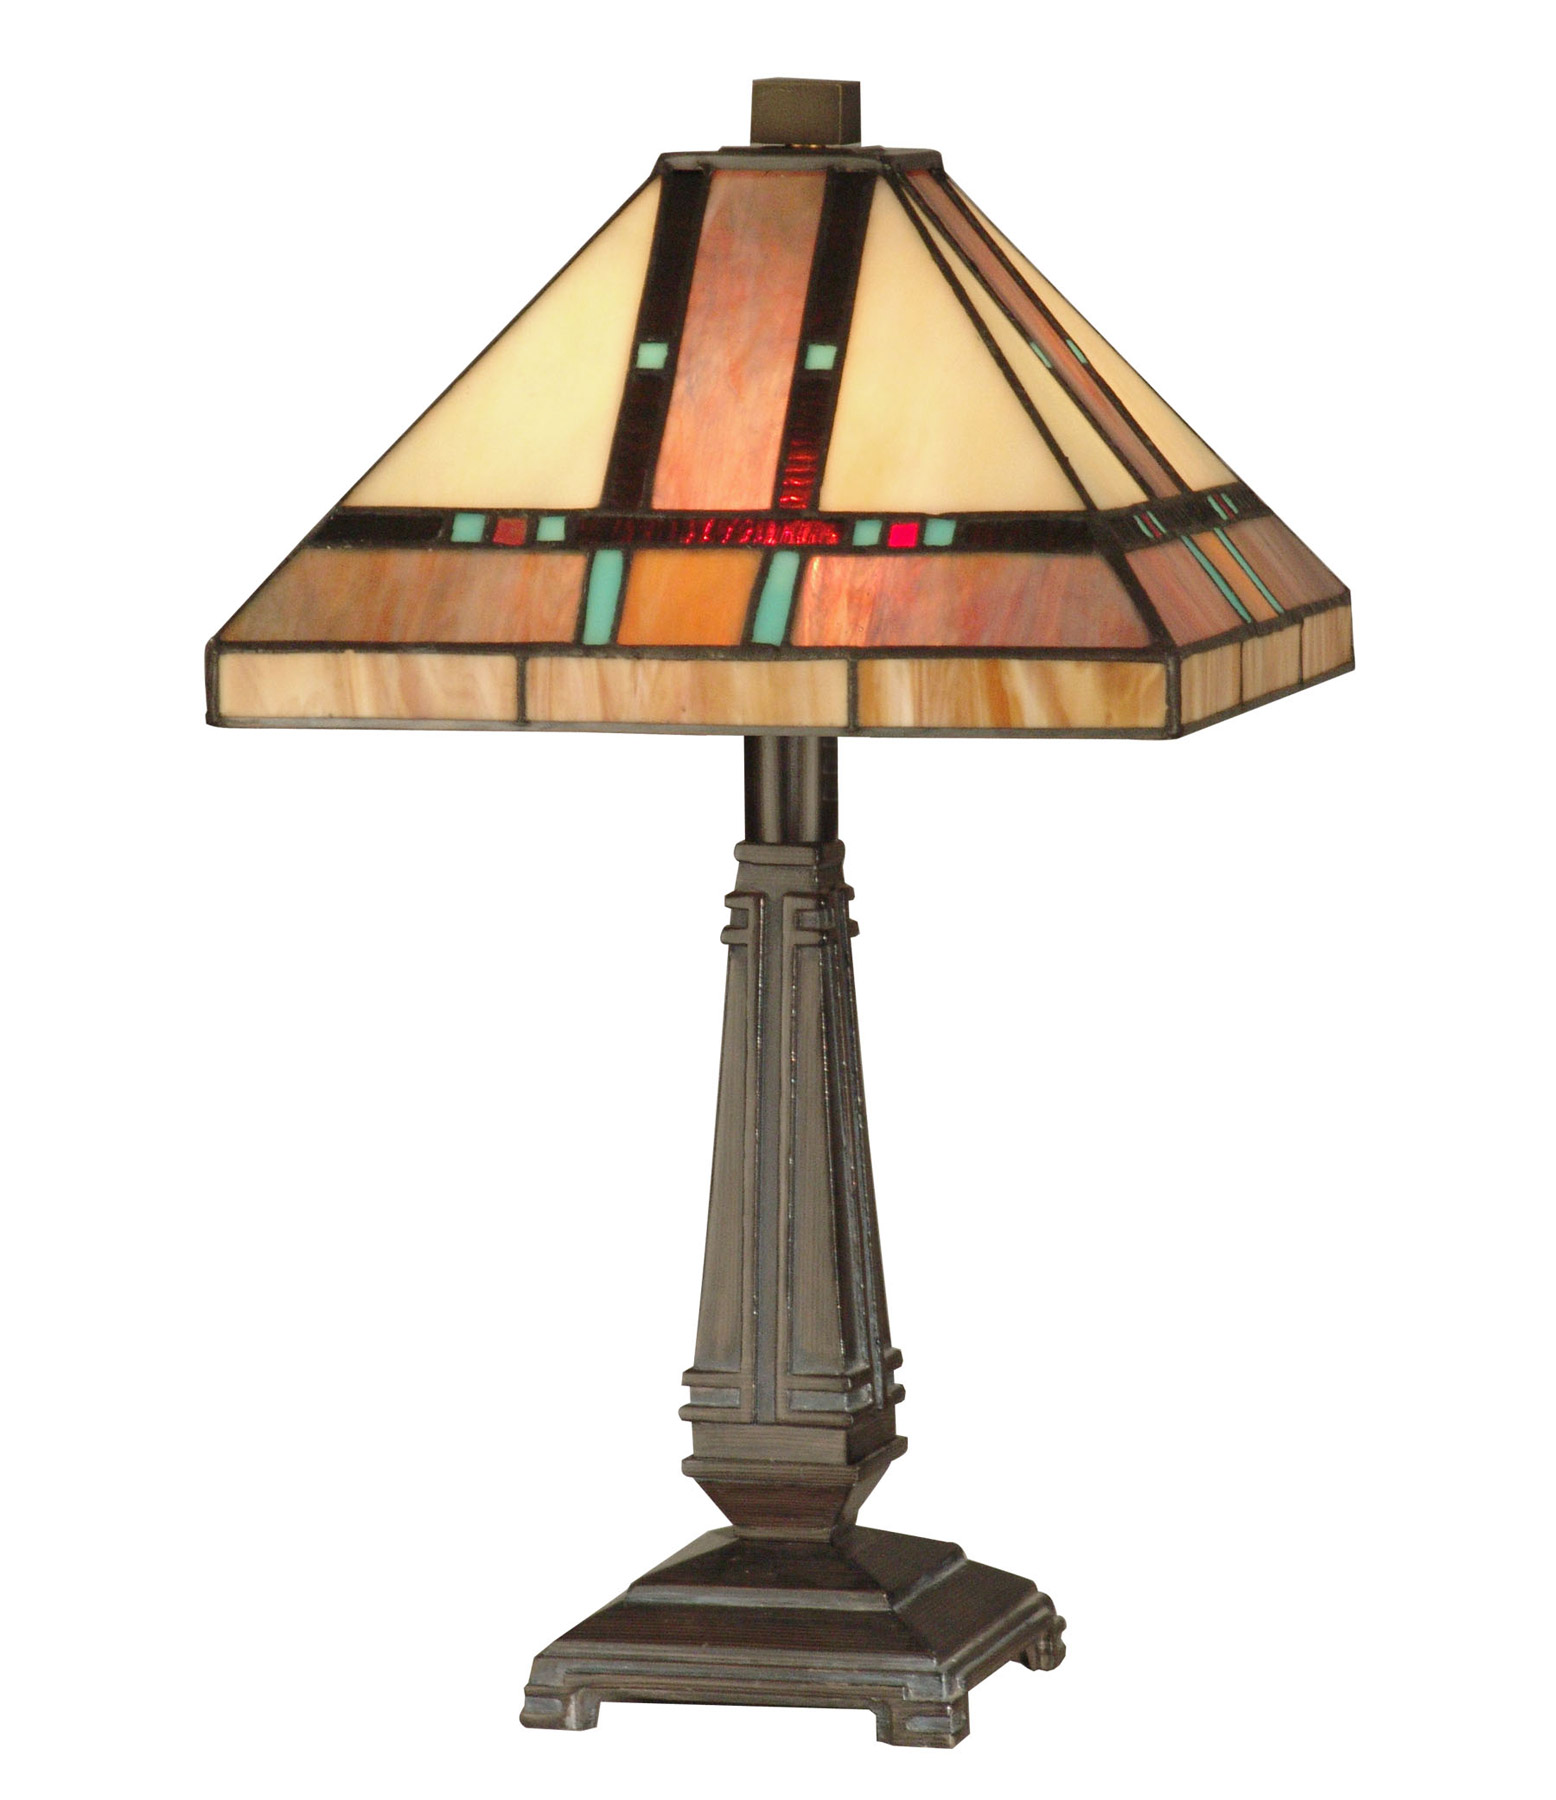 Dale Tiffany Tt10090 Craftsman Petite Table Lamp